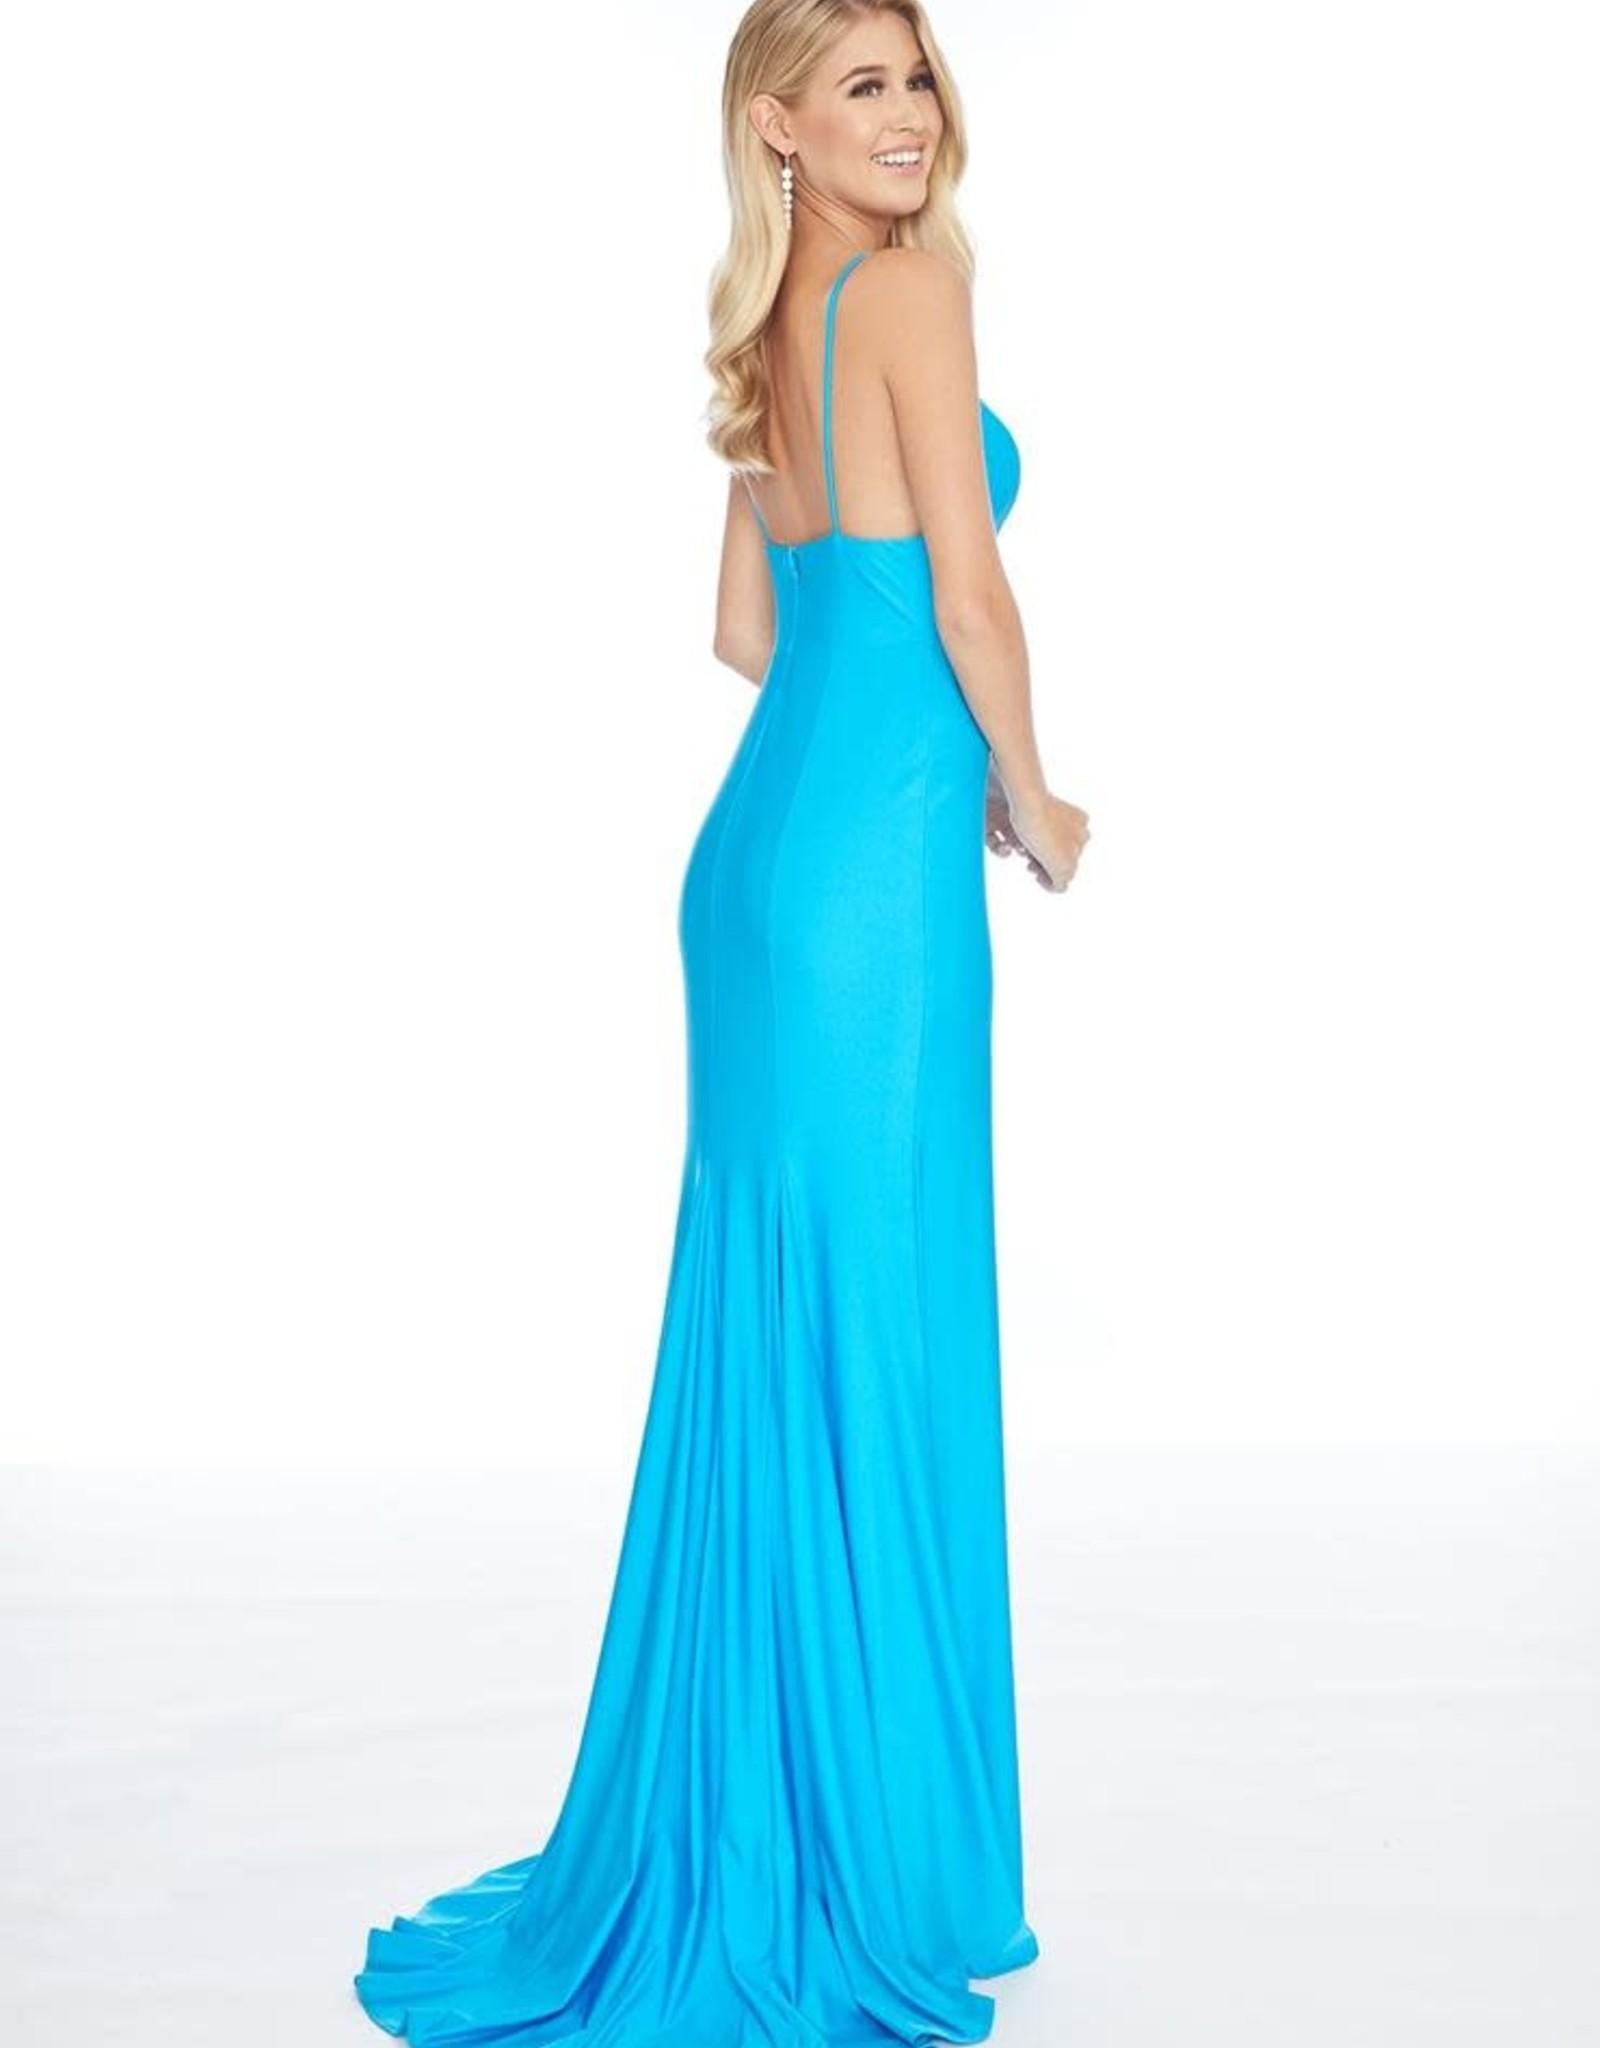 Ashley Lauren Ashley Lauren Turquoise 4